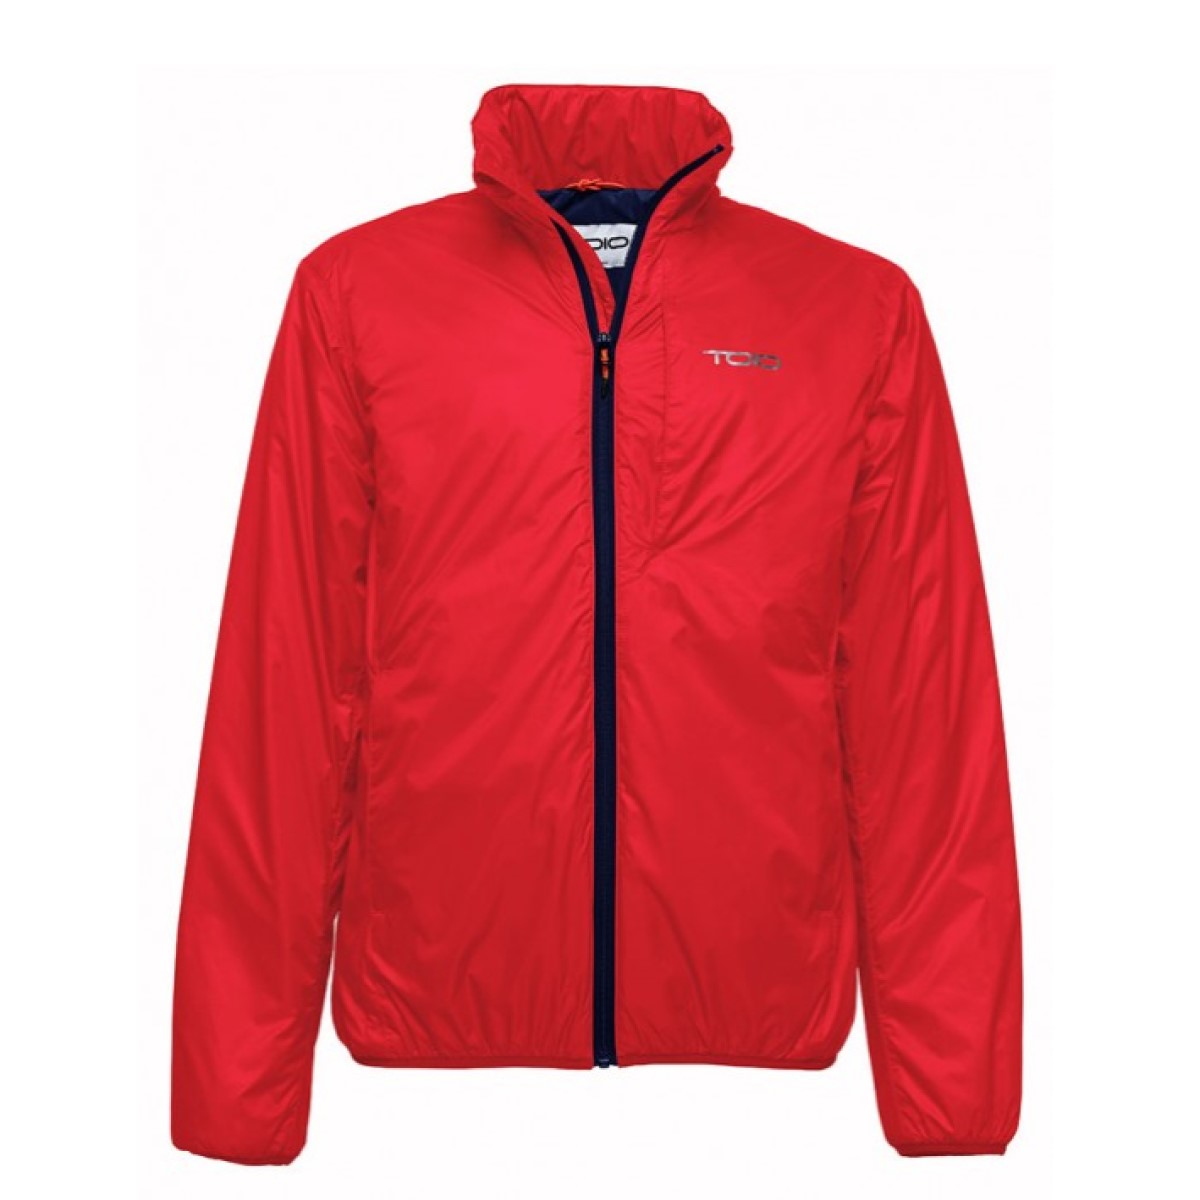 Toio - Boom jacket